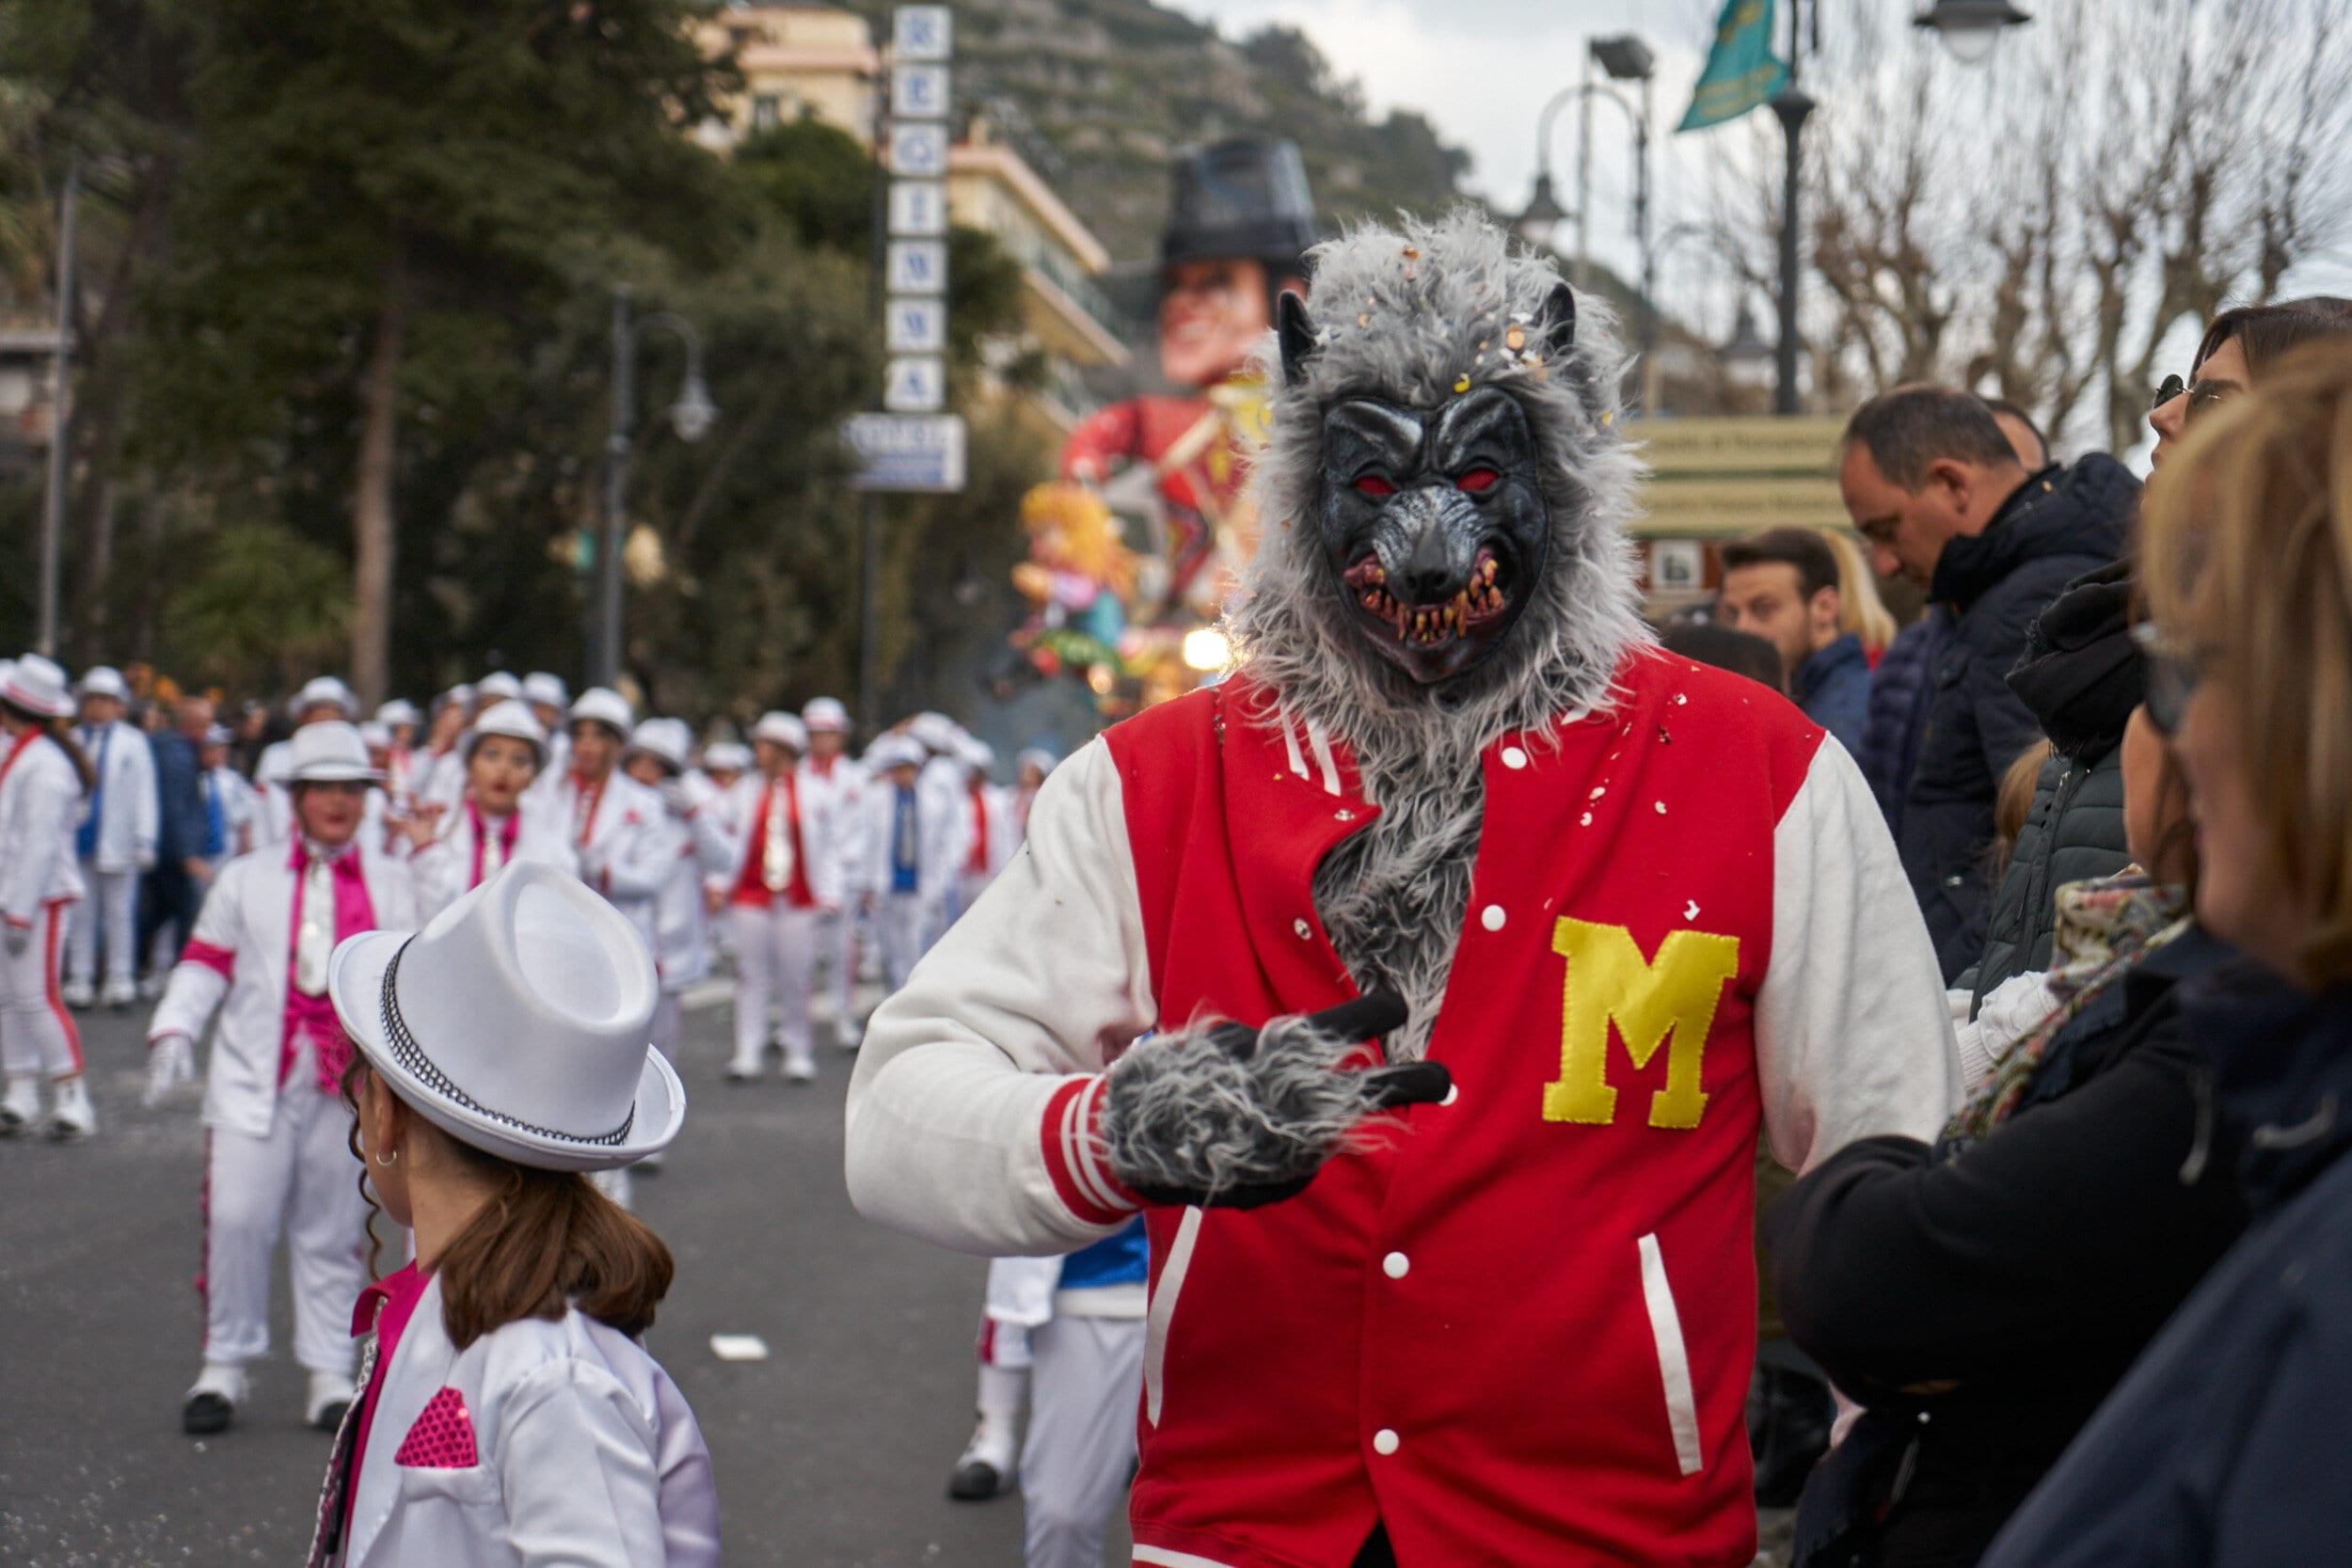 Повозки и танцы на Карнавале в Майори 1 марта